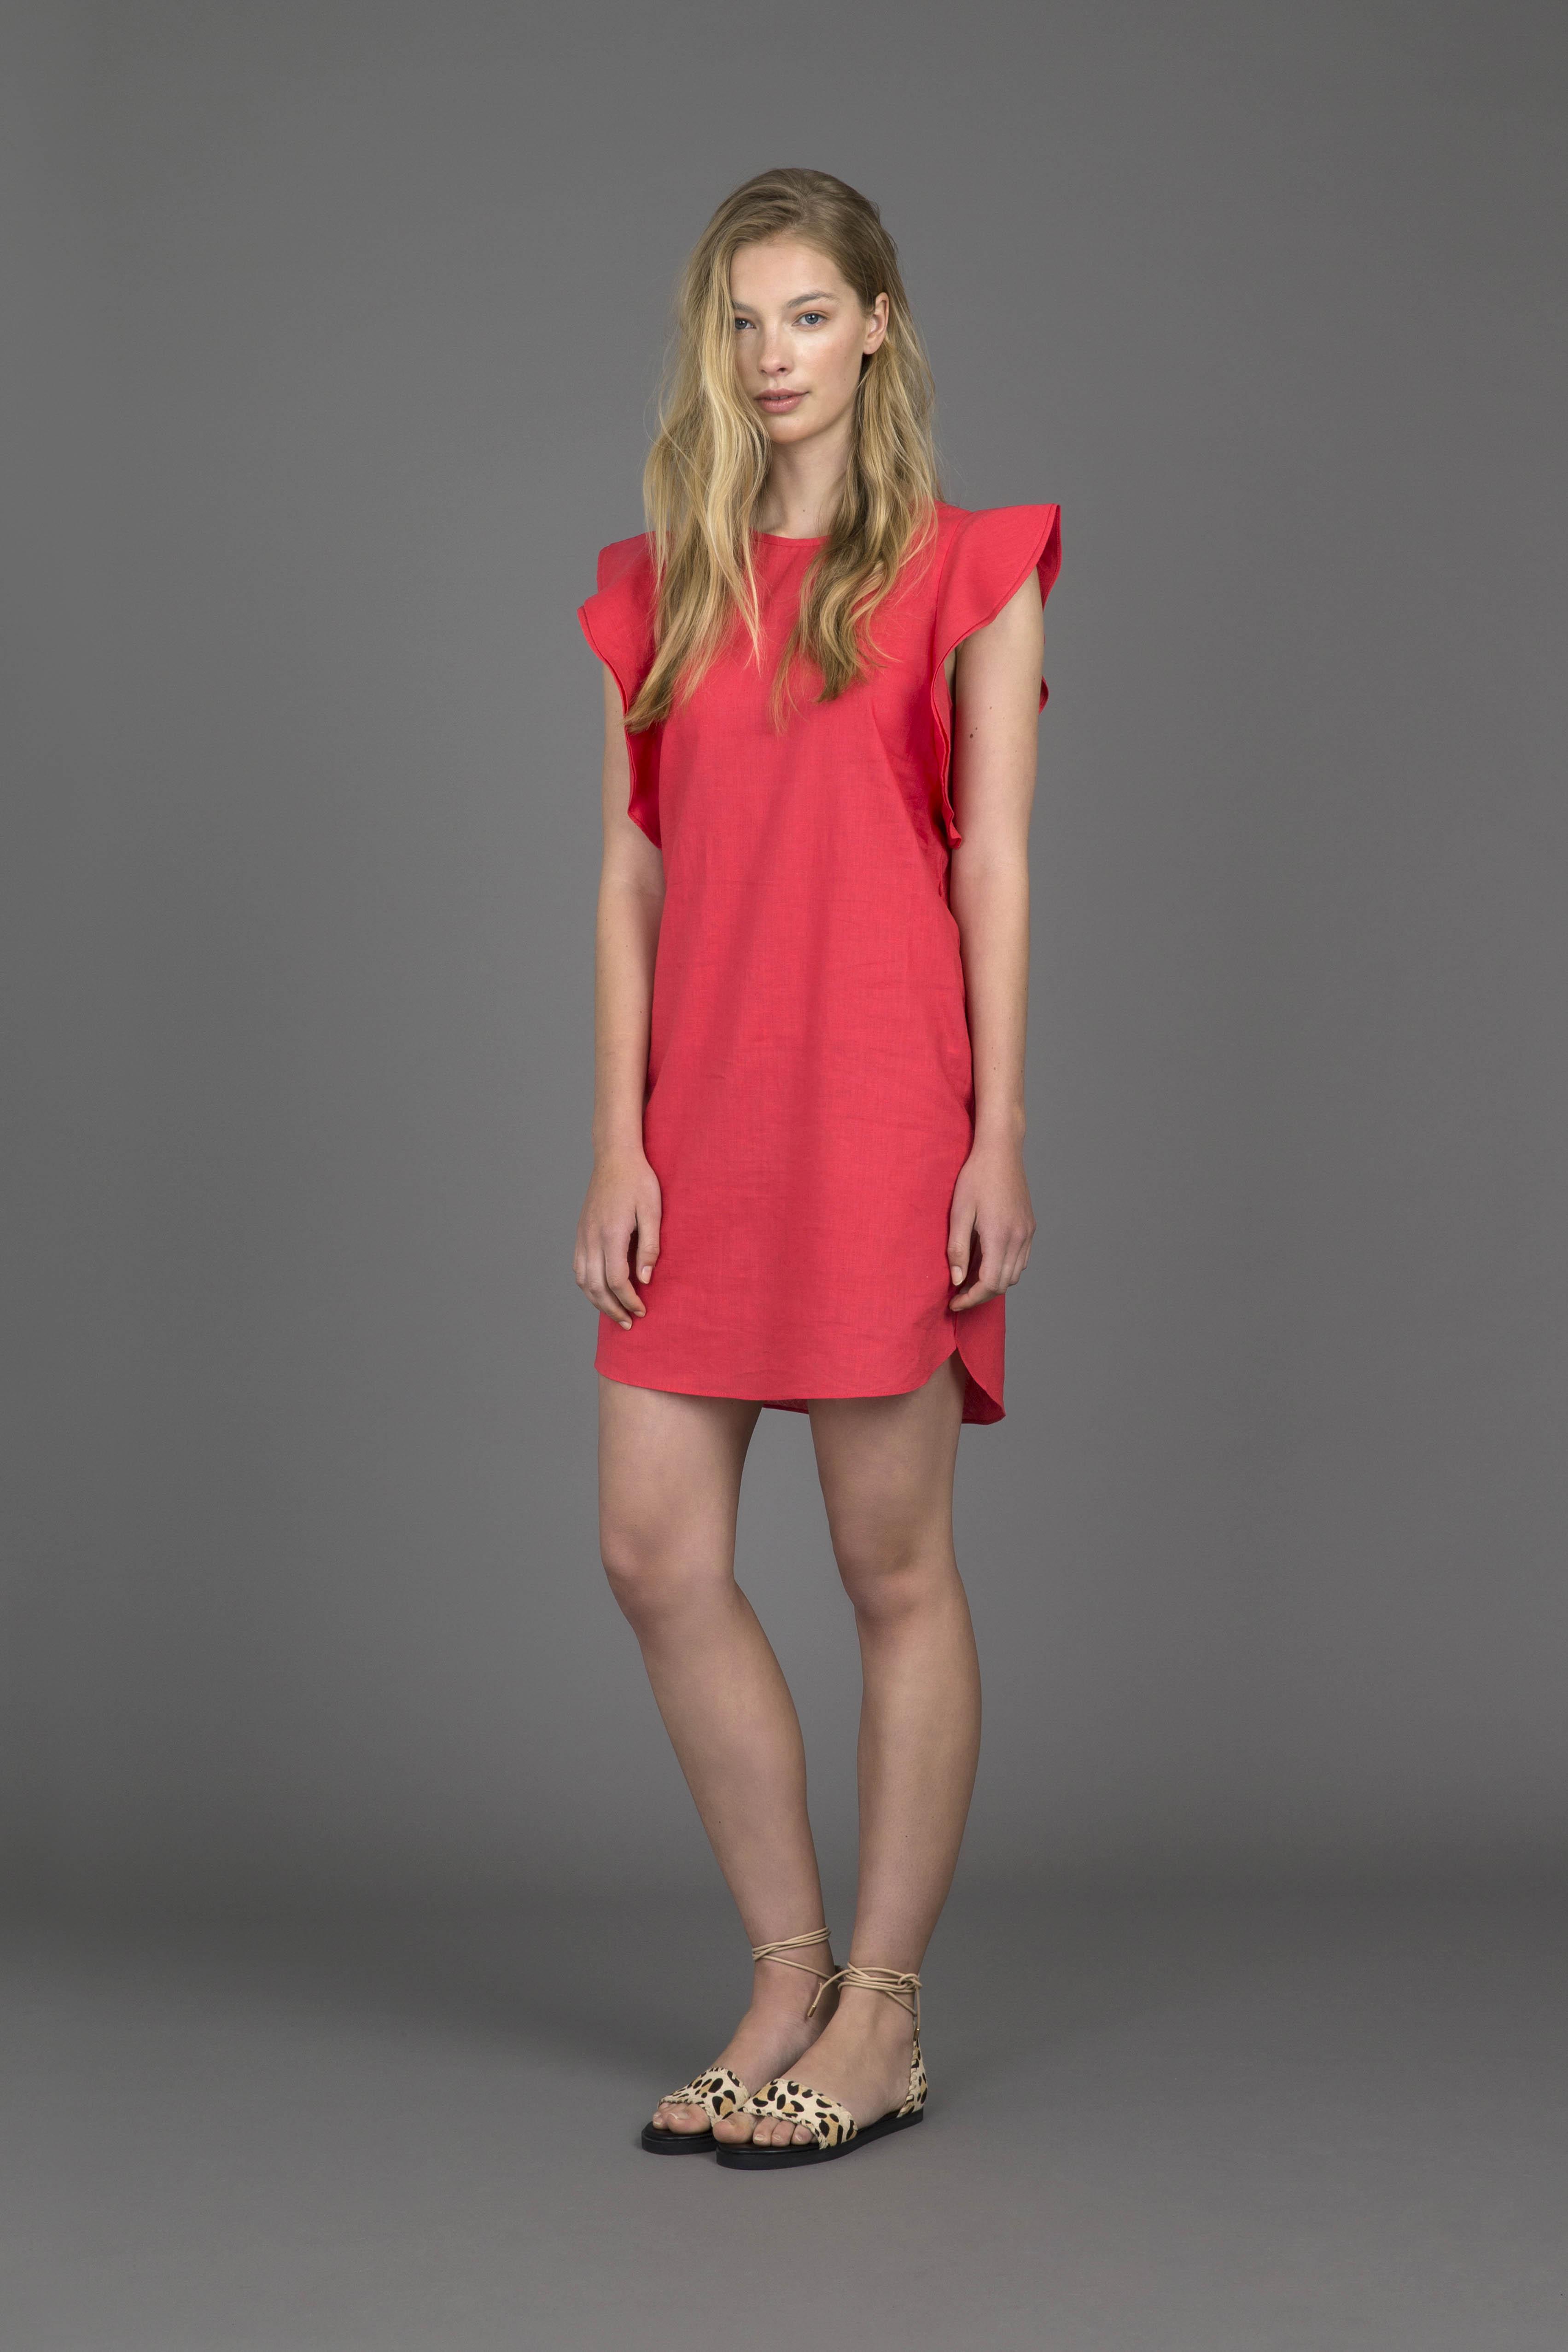 ruby-adeola-ruffle-dress